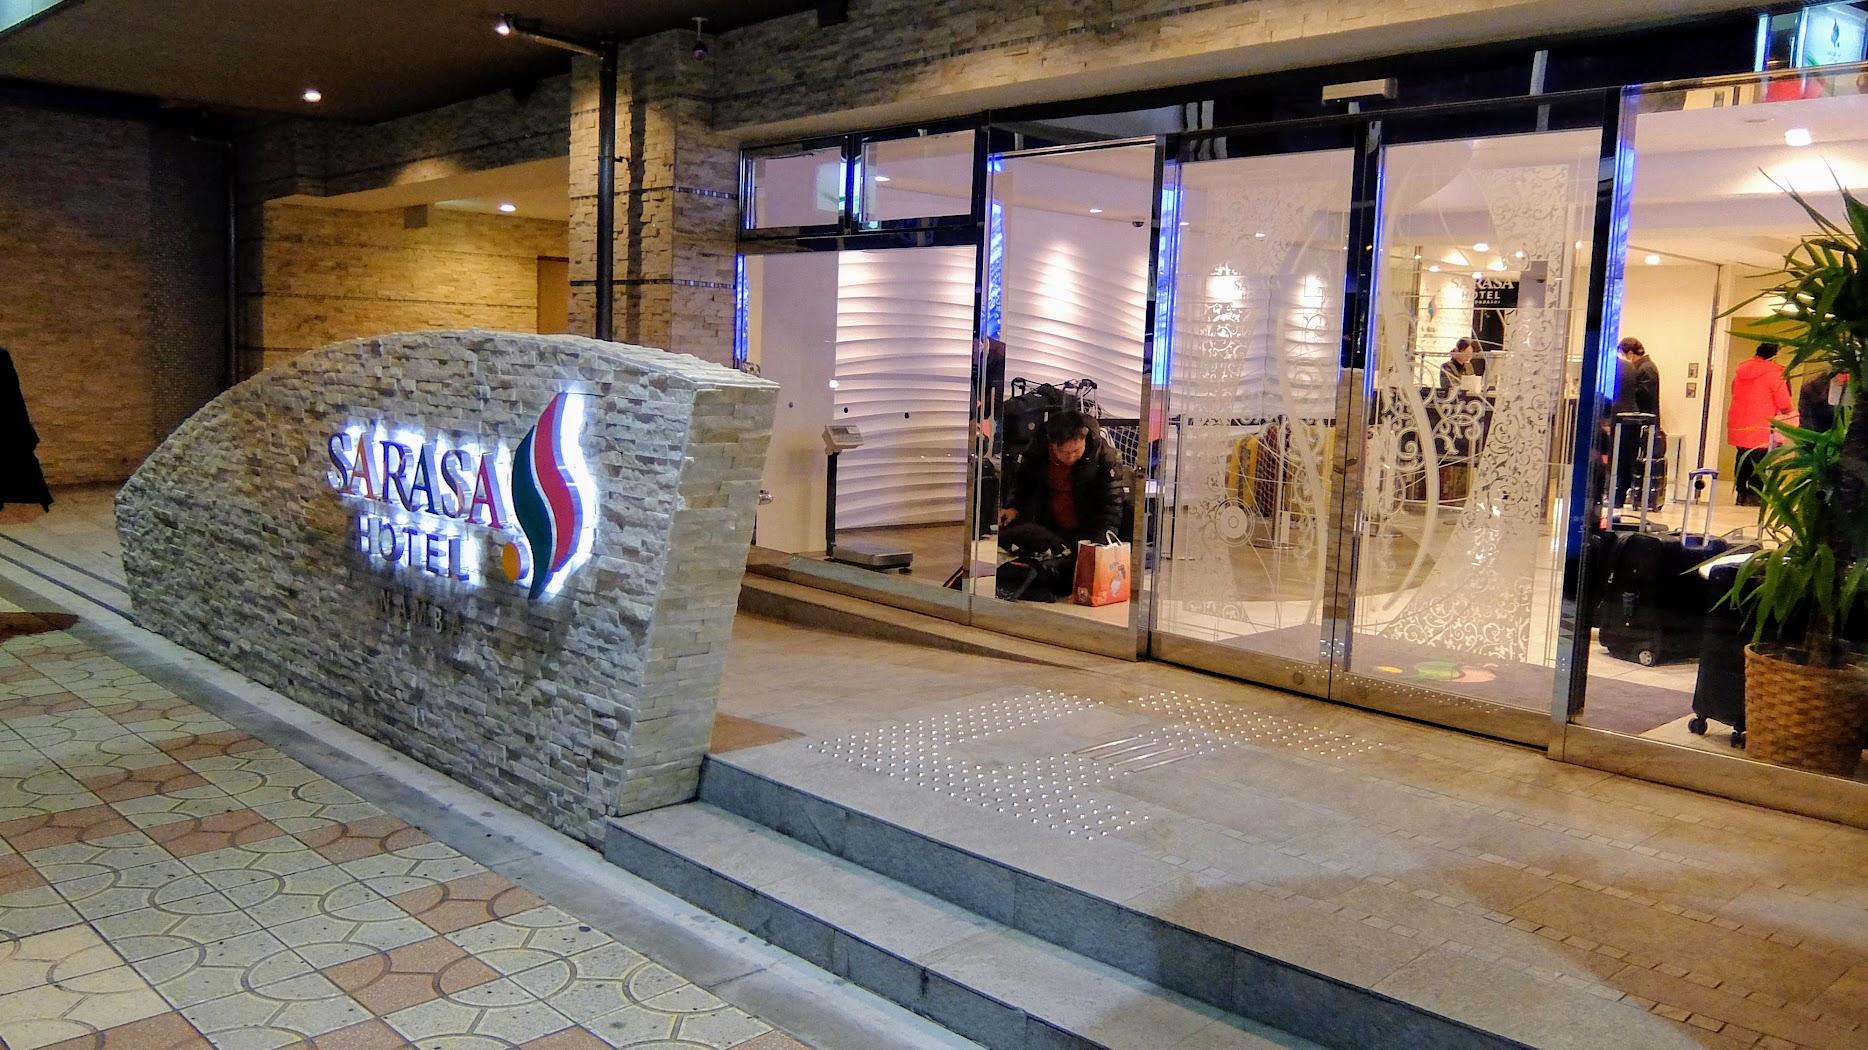 SARASA HOTEL namba,離南海難波車站大約五分鐘的距離,不過飯店旁邊就是日本橋的商店街XD